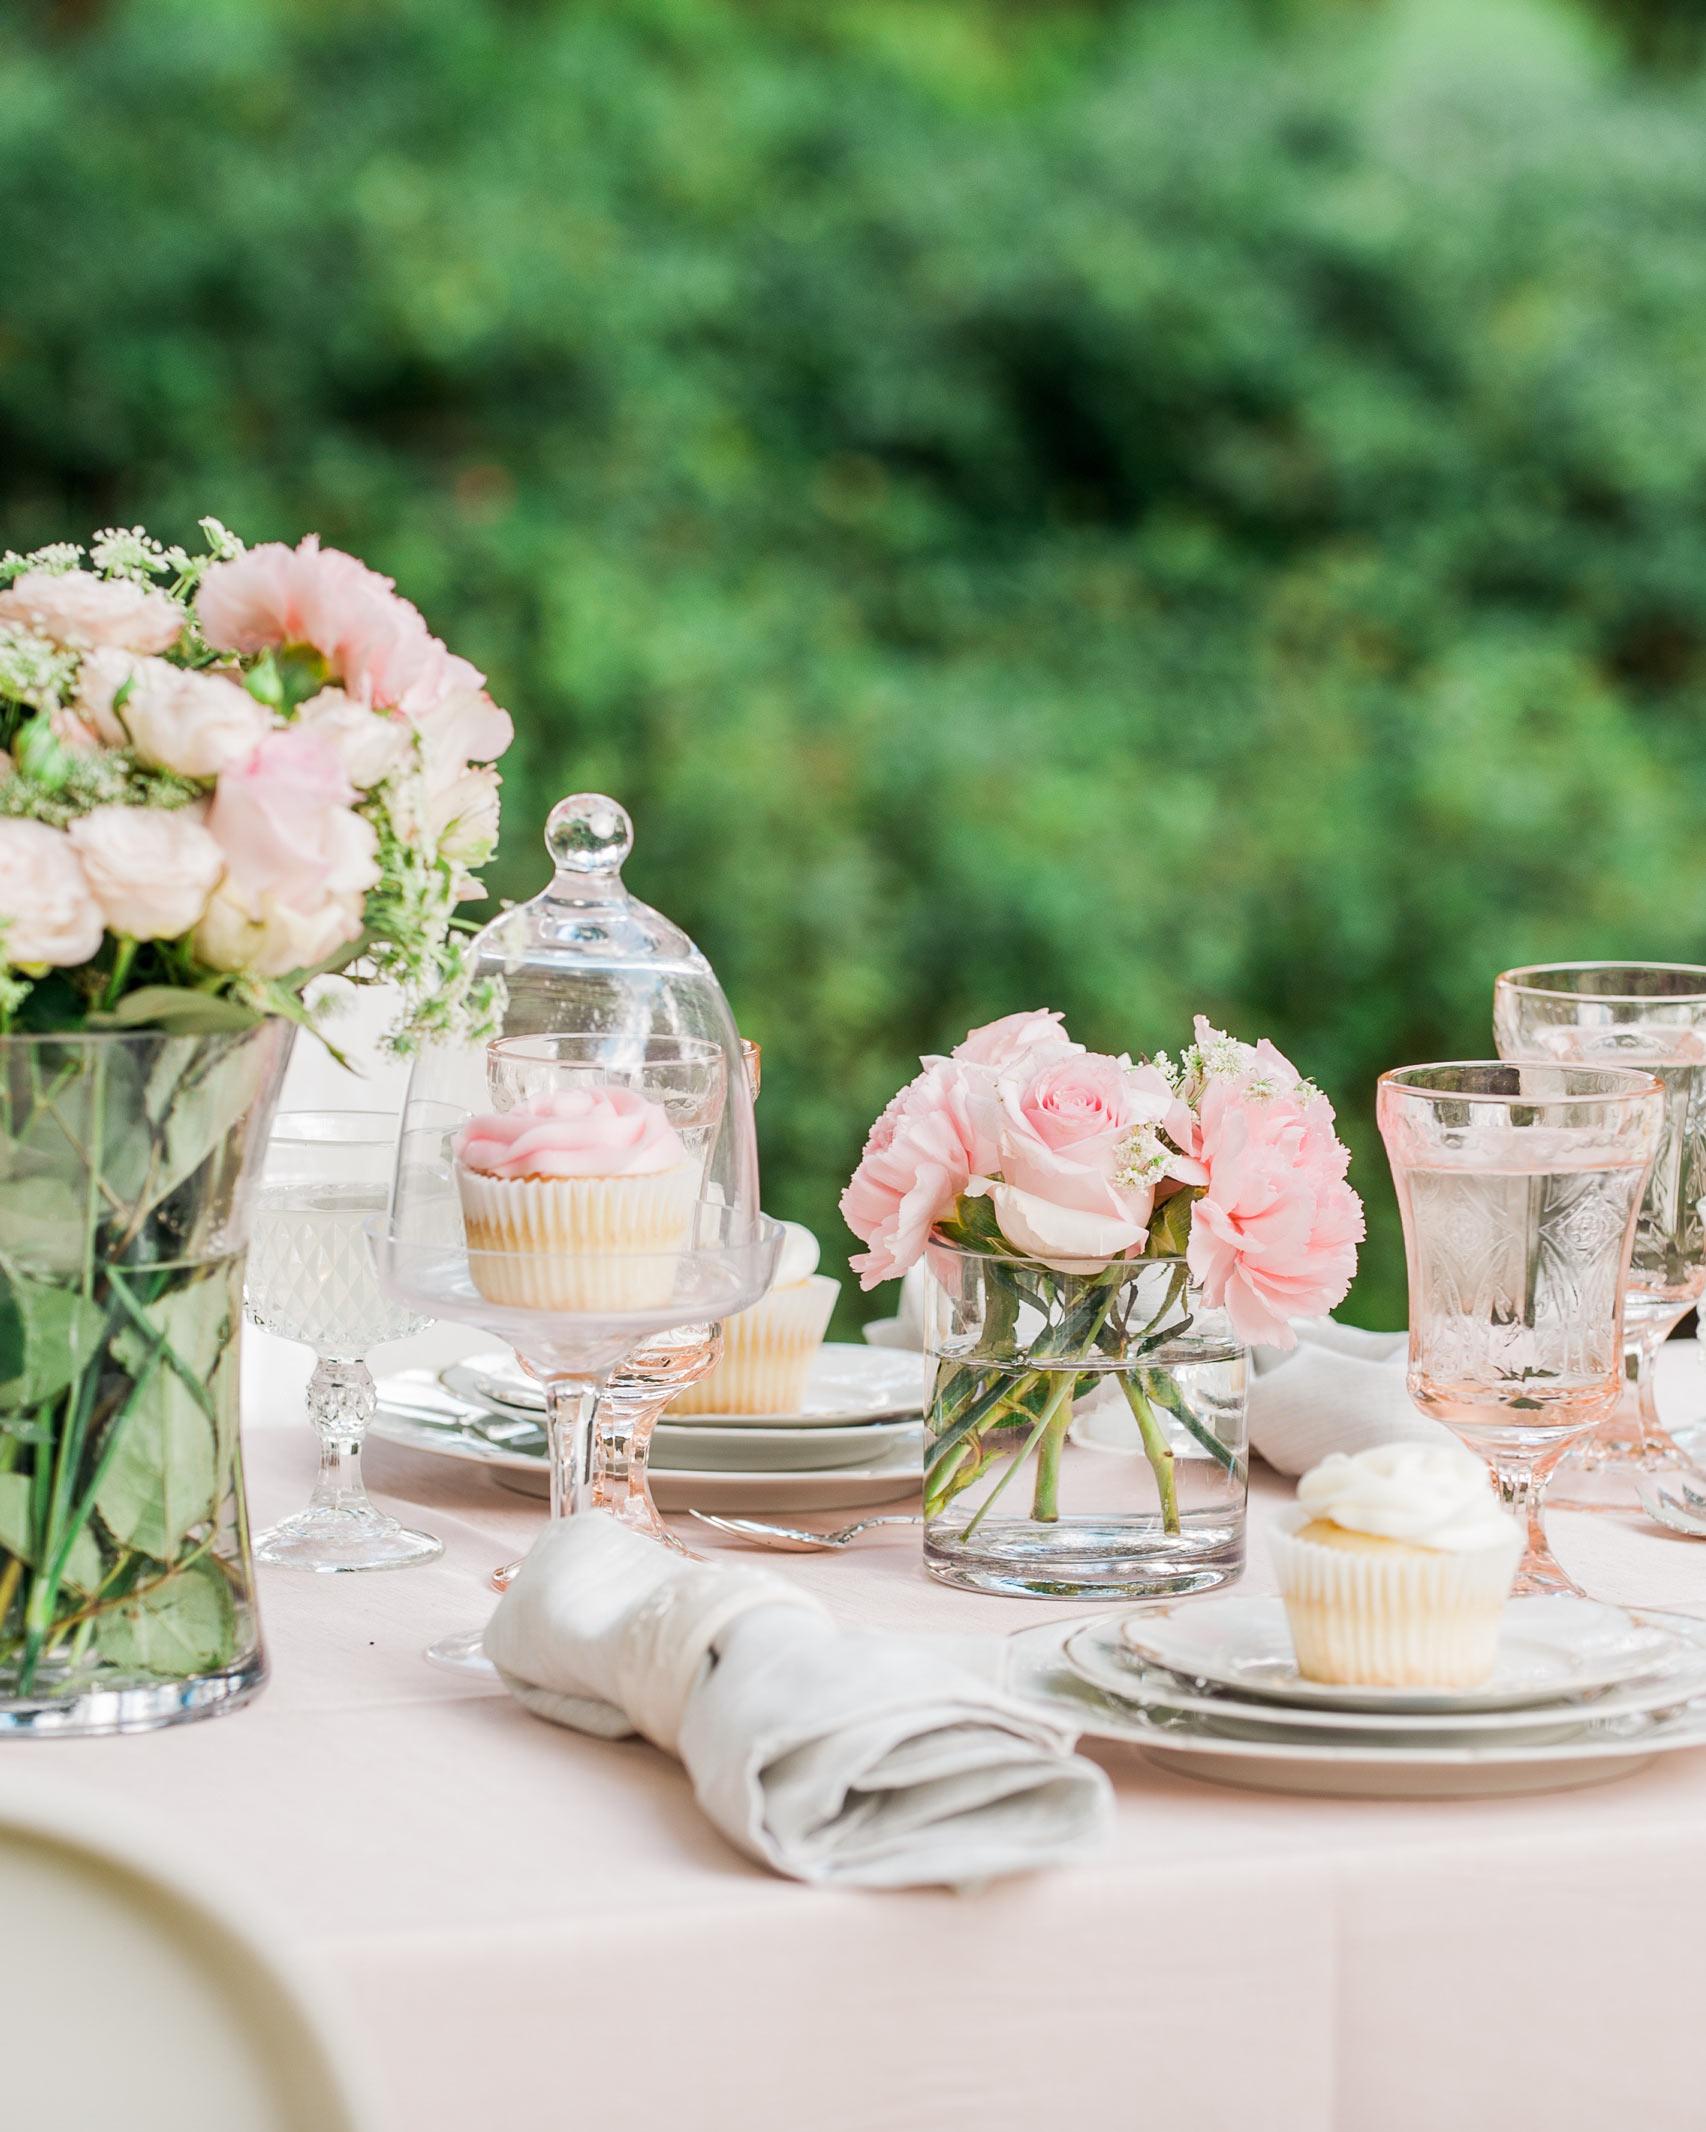 fashionable-hostess-bridal-shower-table-scape-0416.jpg